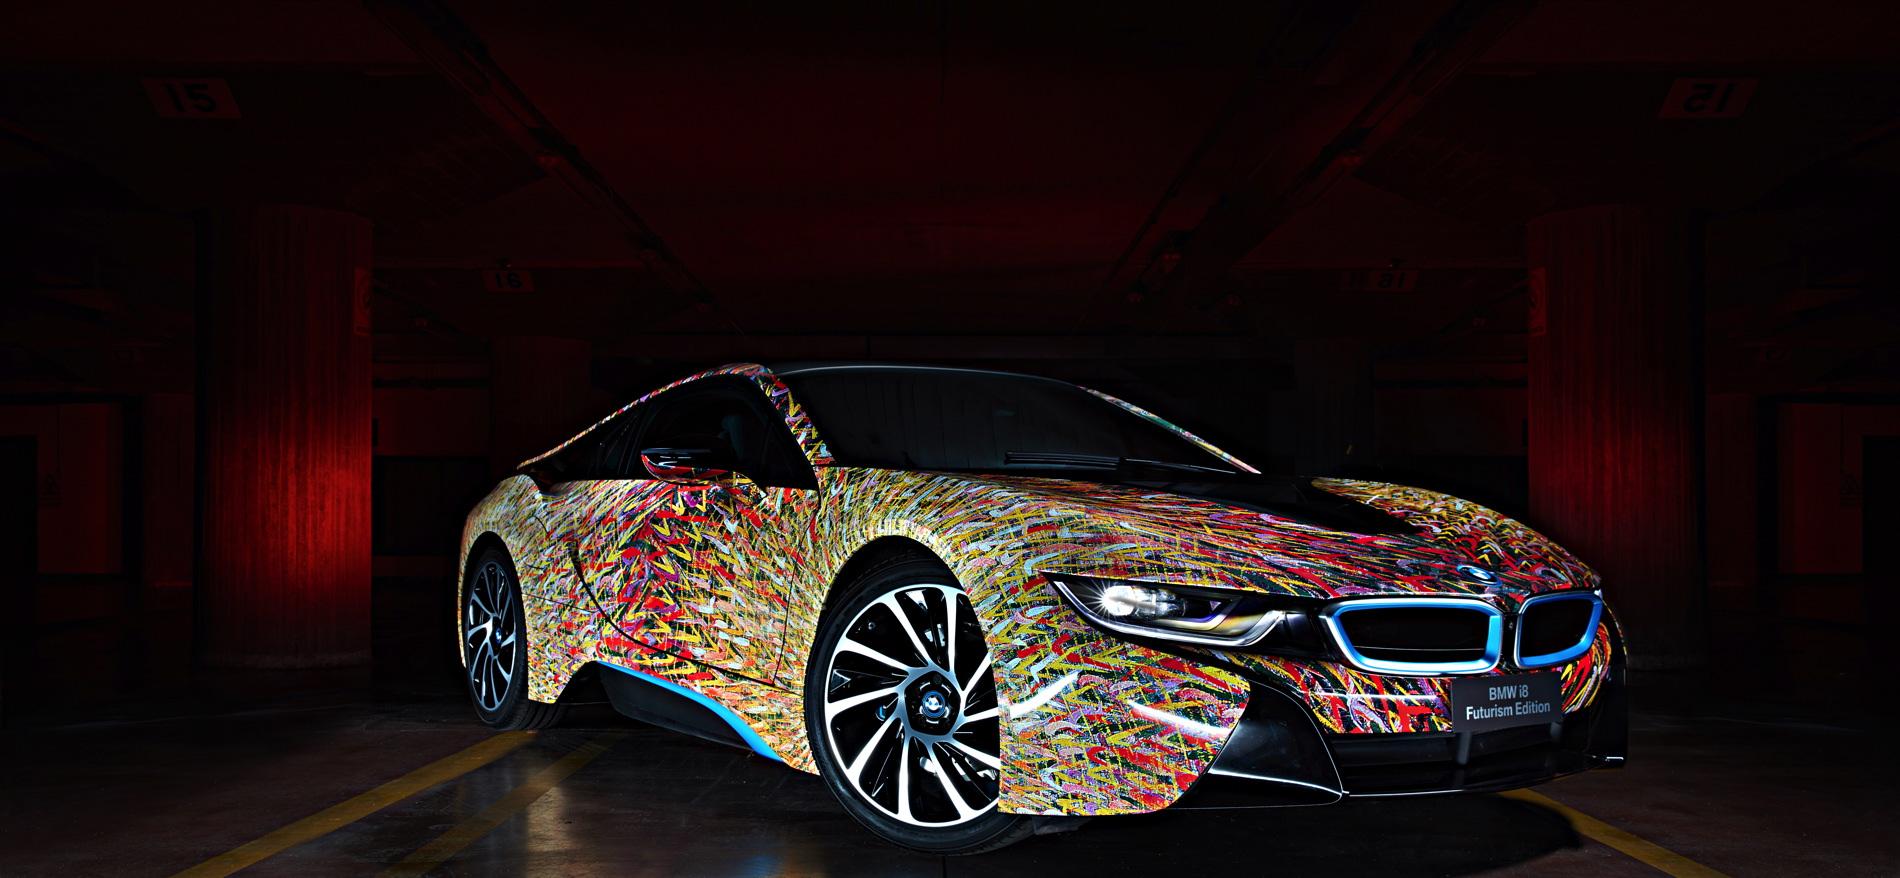 BMW i8 Futurism Edition 7